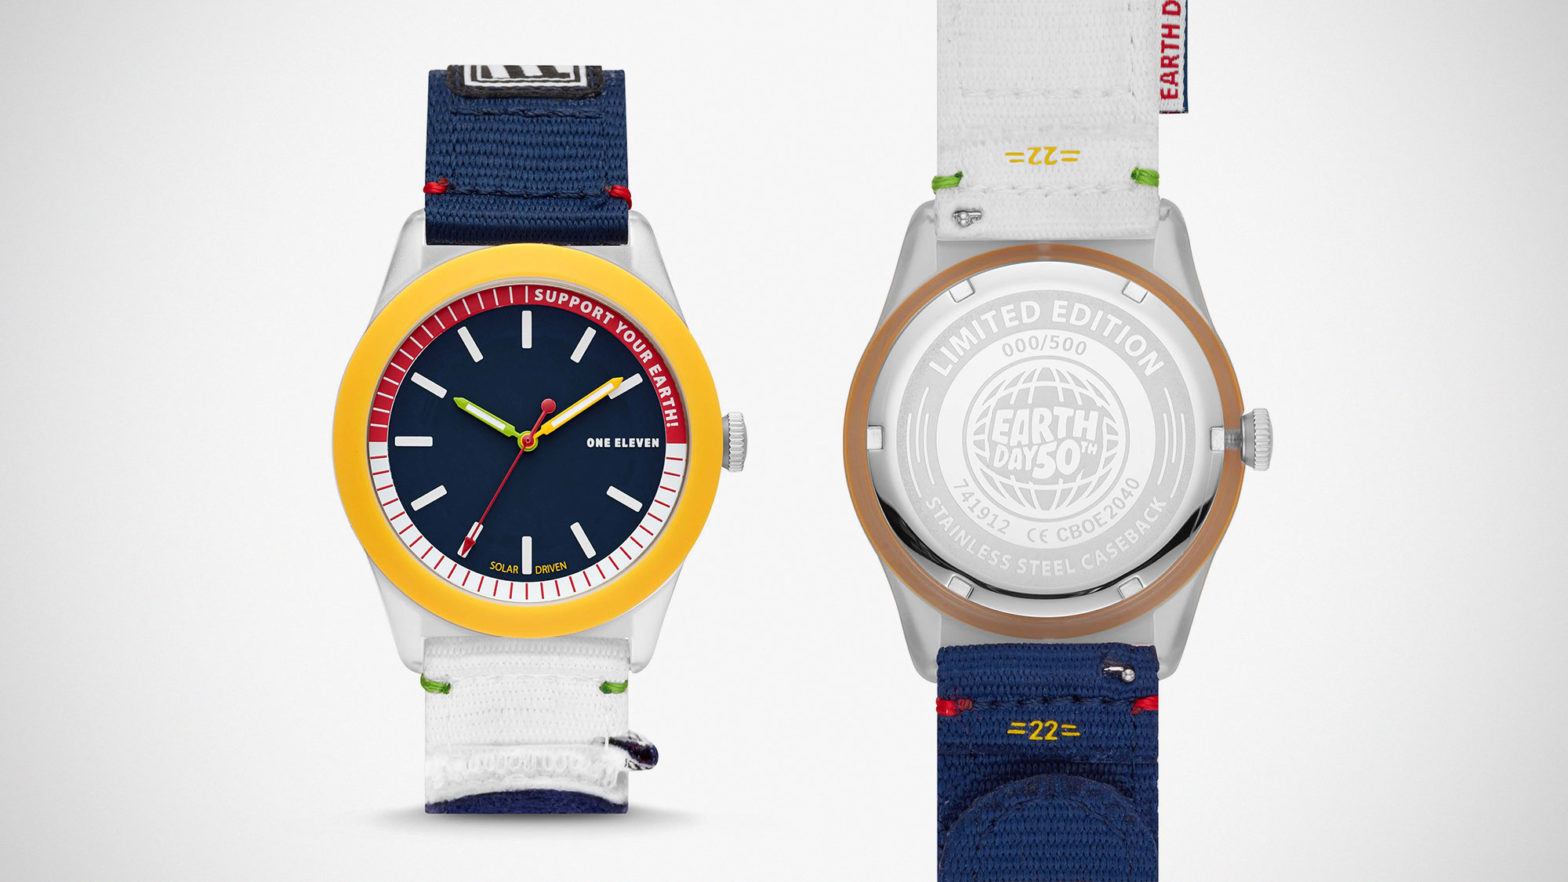 Earth Day Solar Powered SWII Wrist Watch